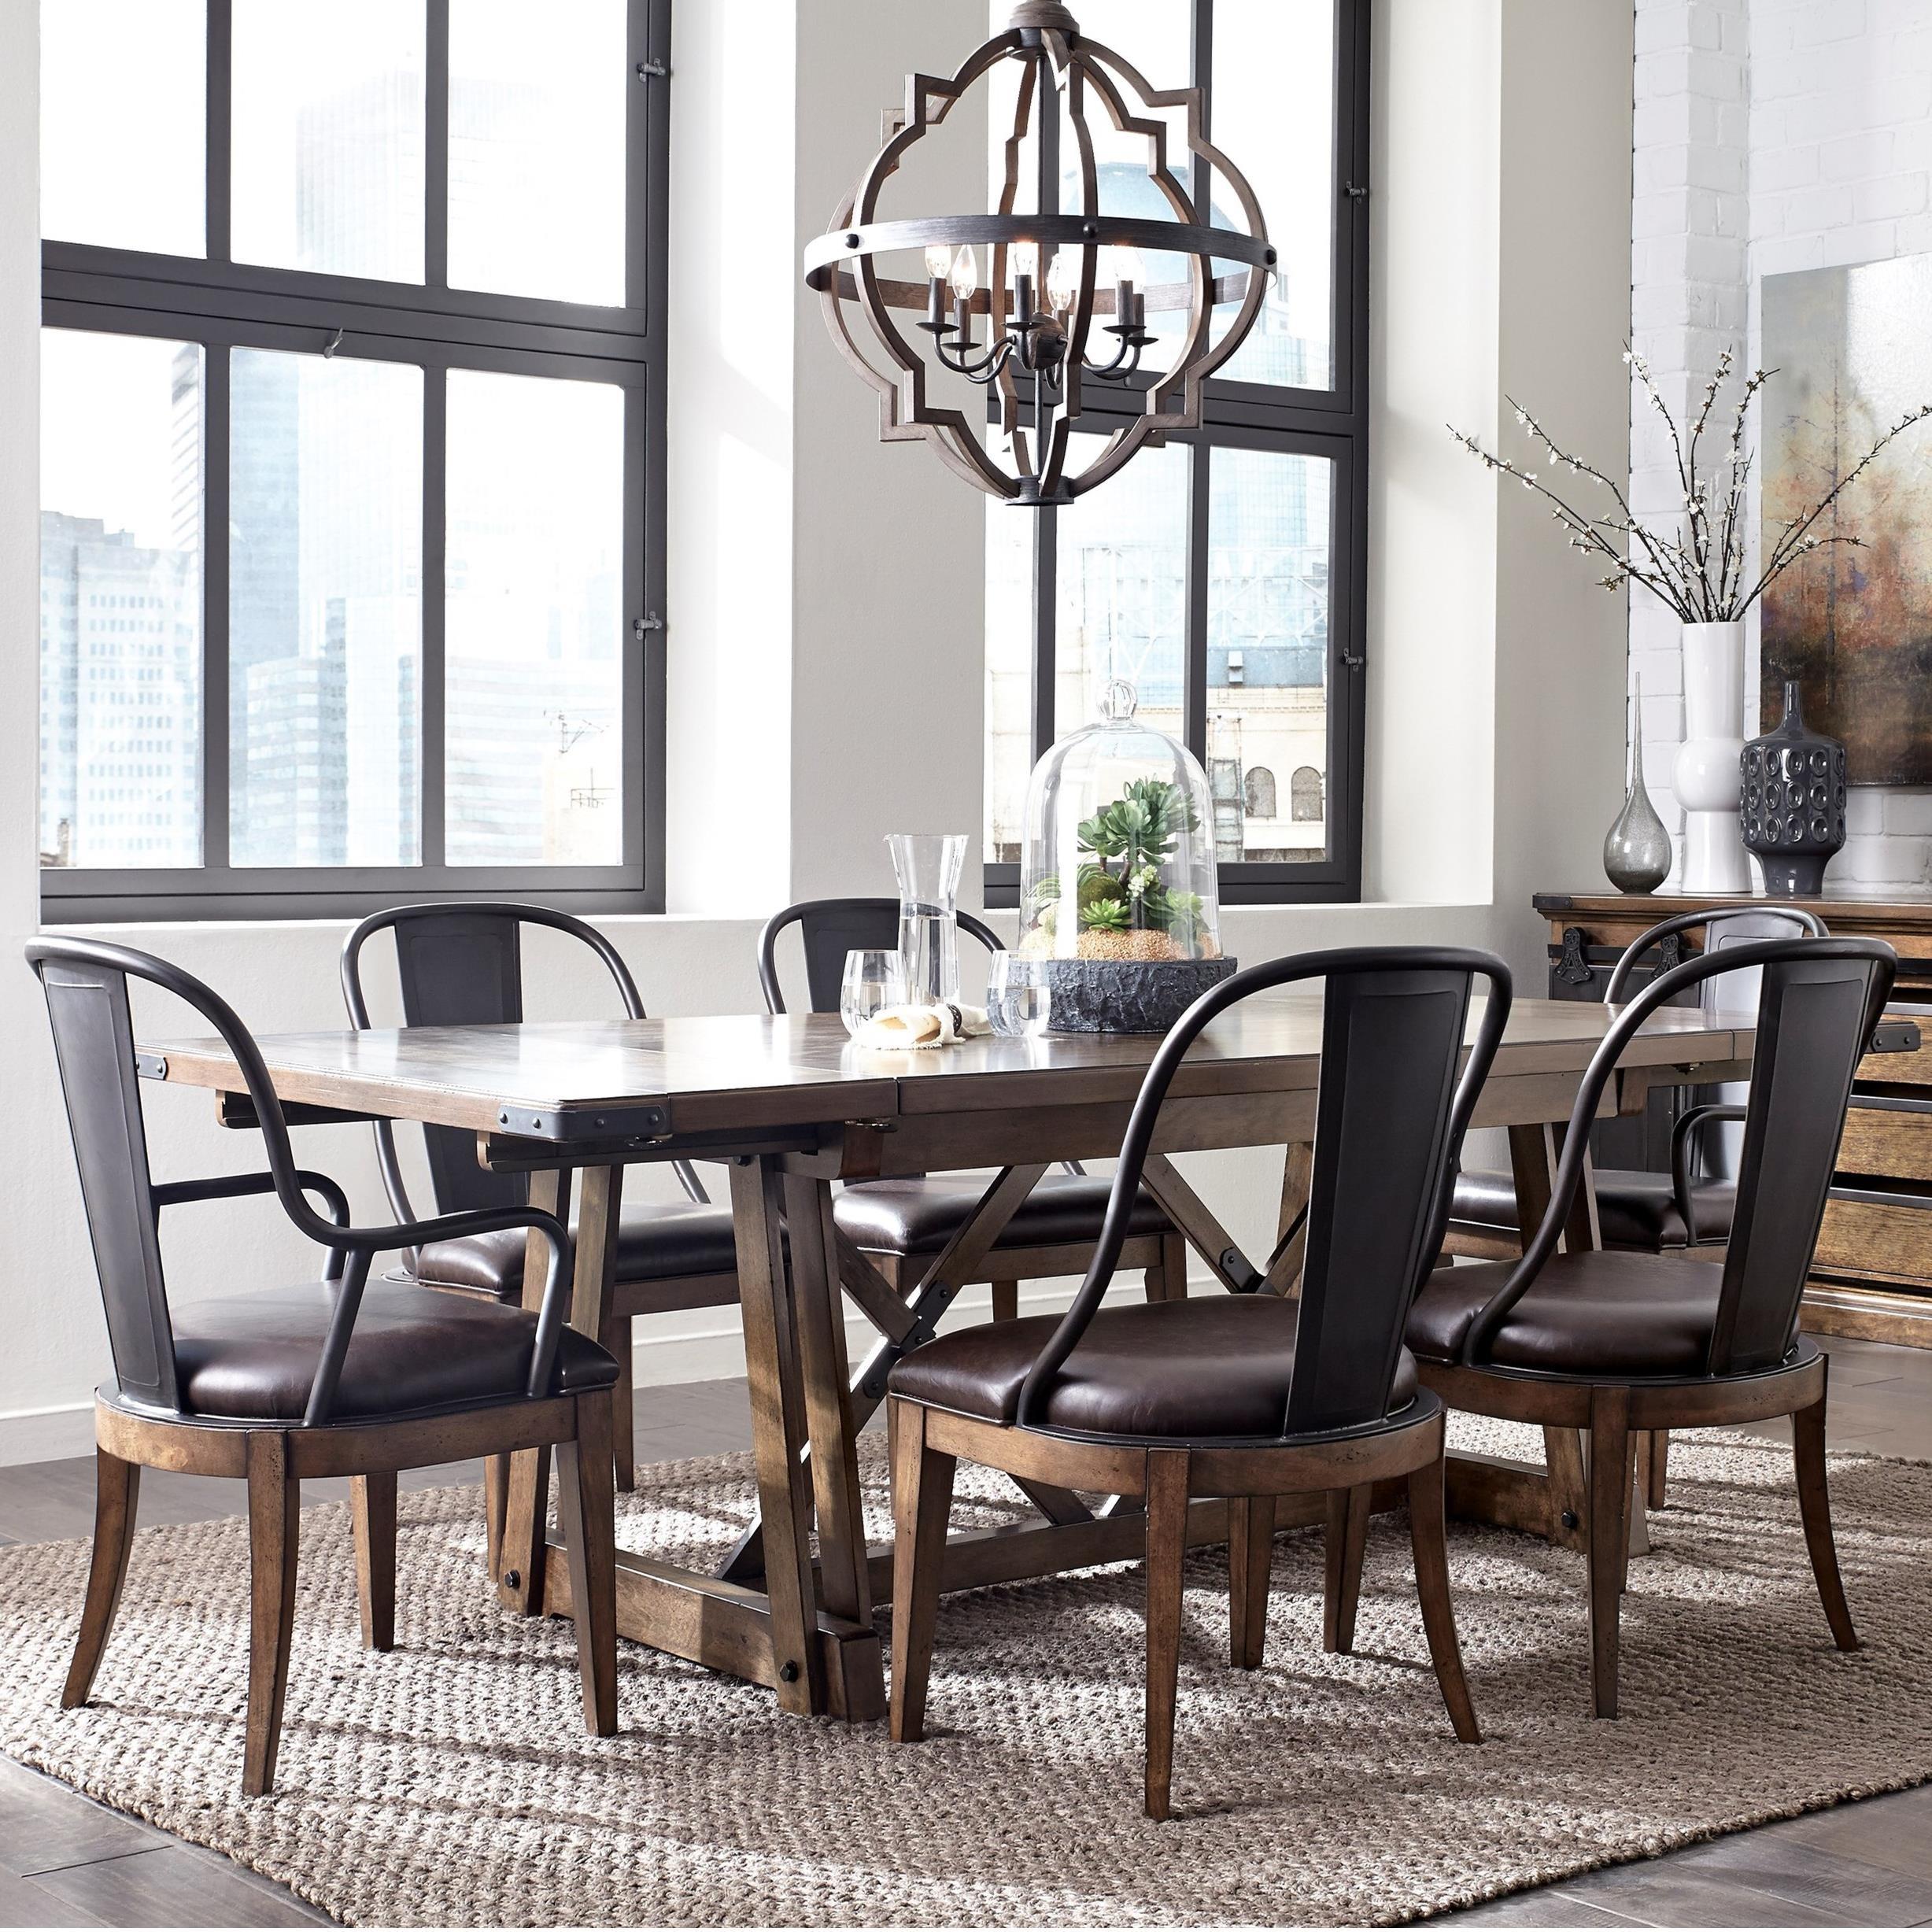 Pulaski Furniture Weston Loft7 Piece Table And Chair Set ...